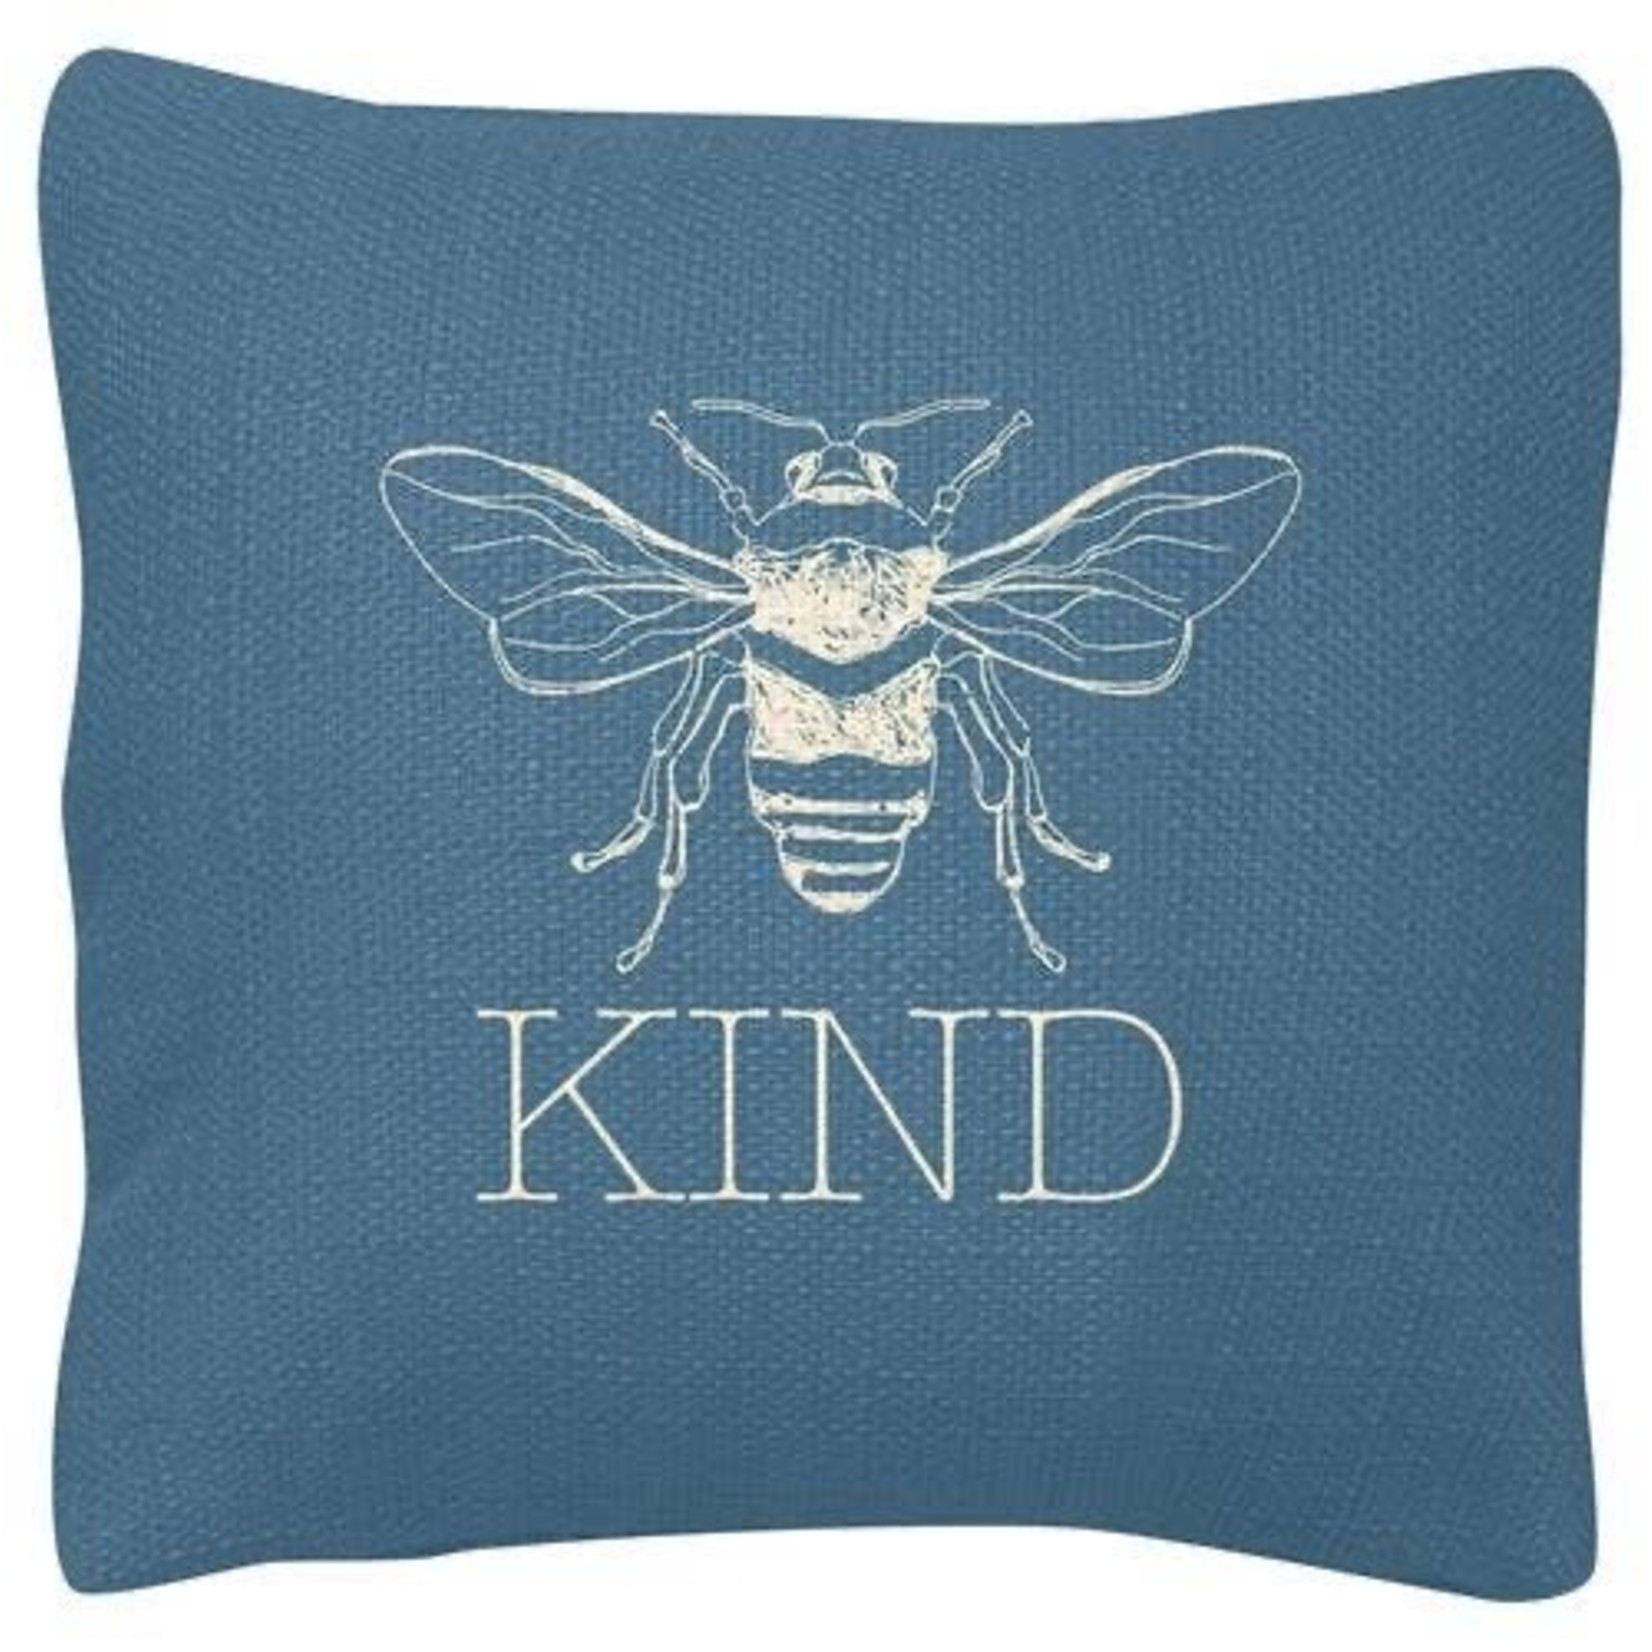 Karma Sqaure Pillow: